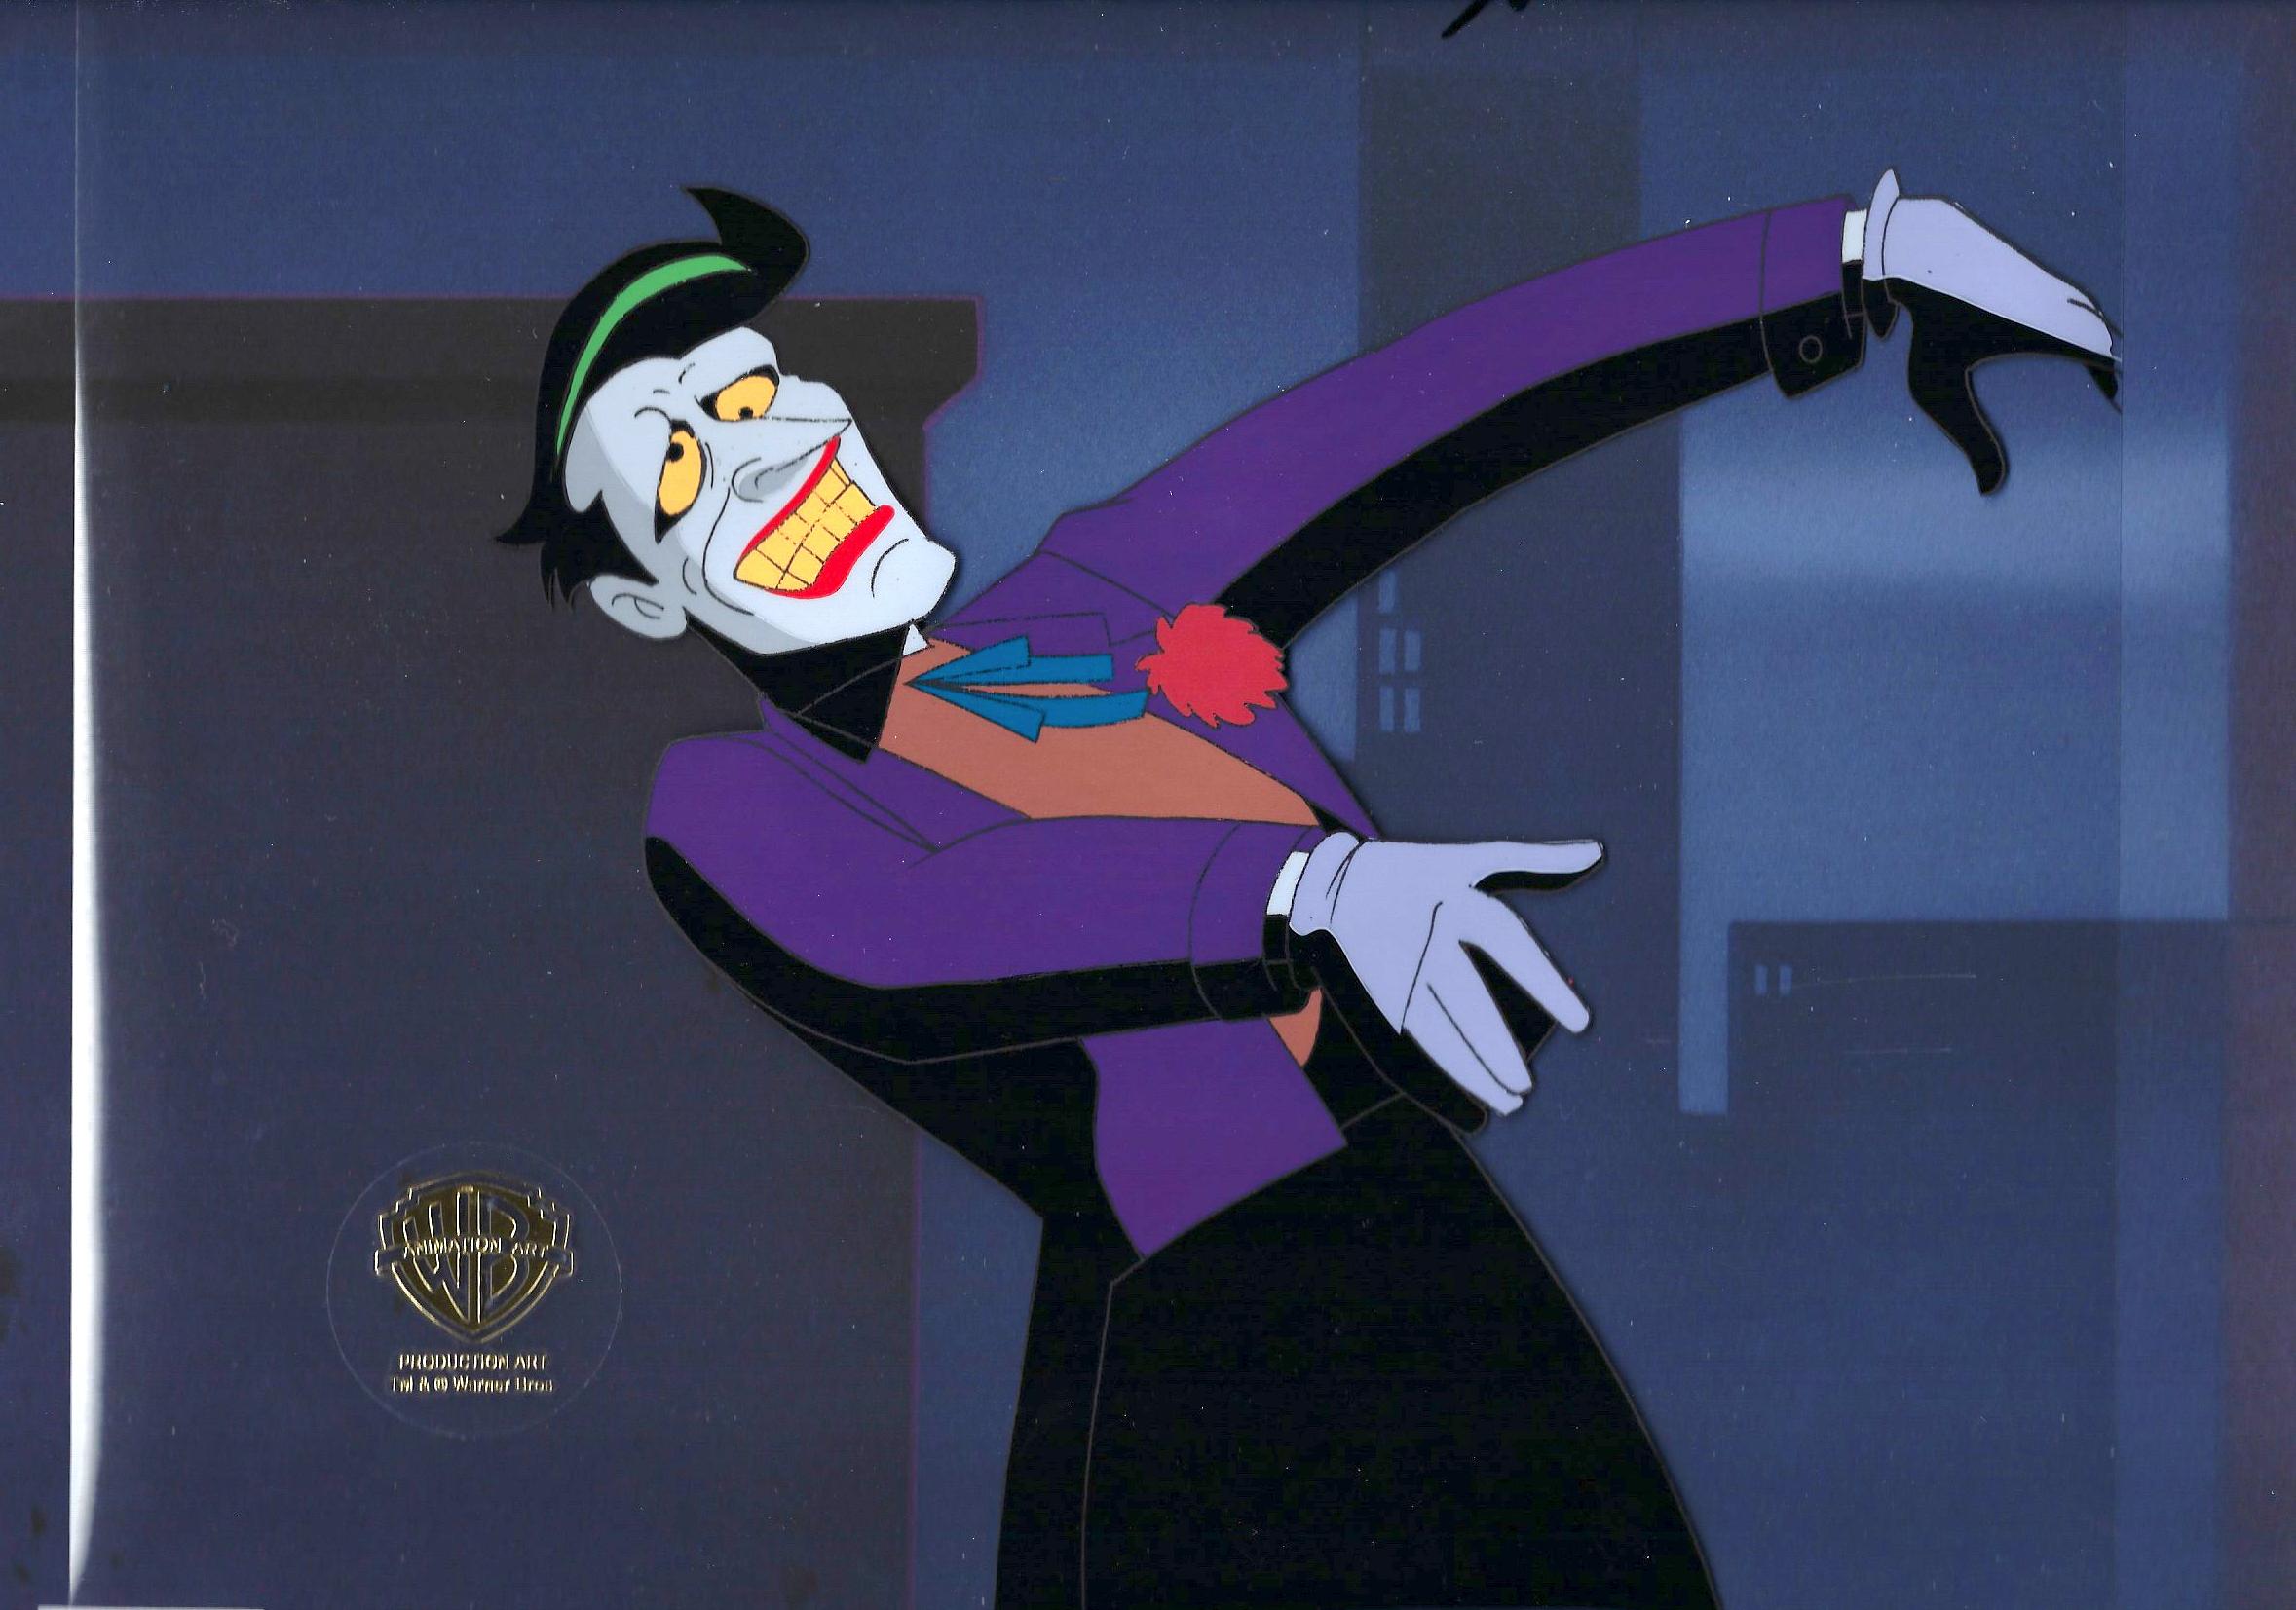 Joker Original Production Cel From Batgirl Returns Batman The Animated Series